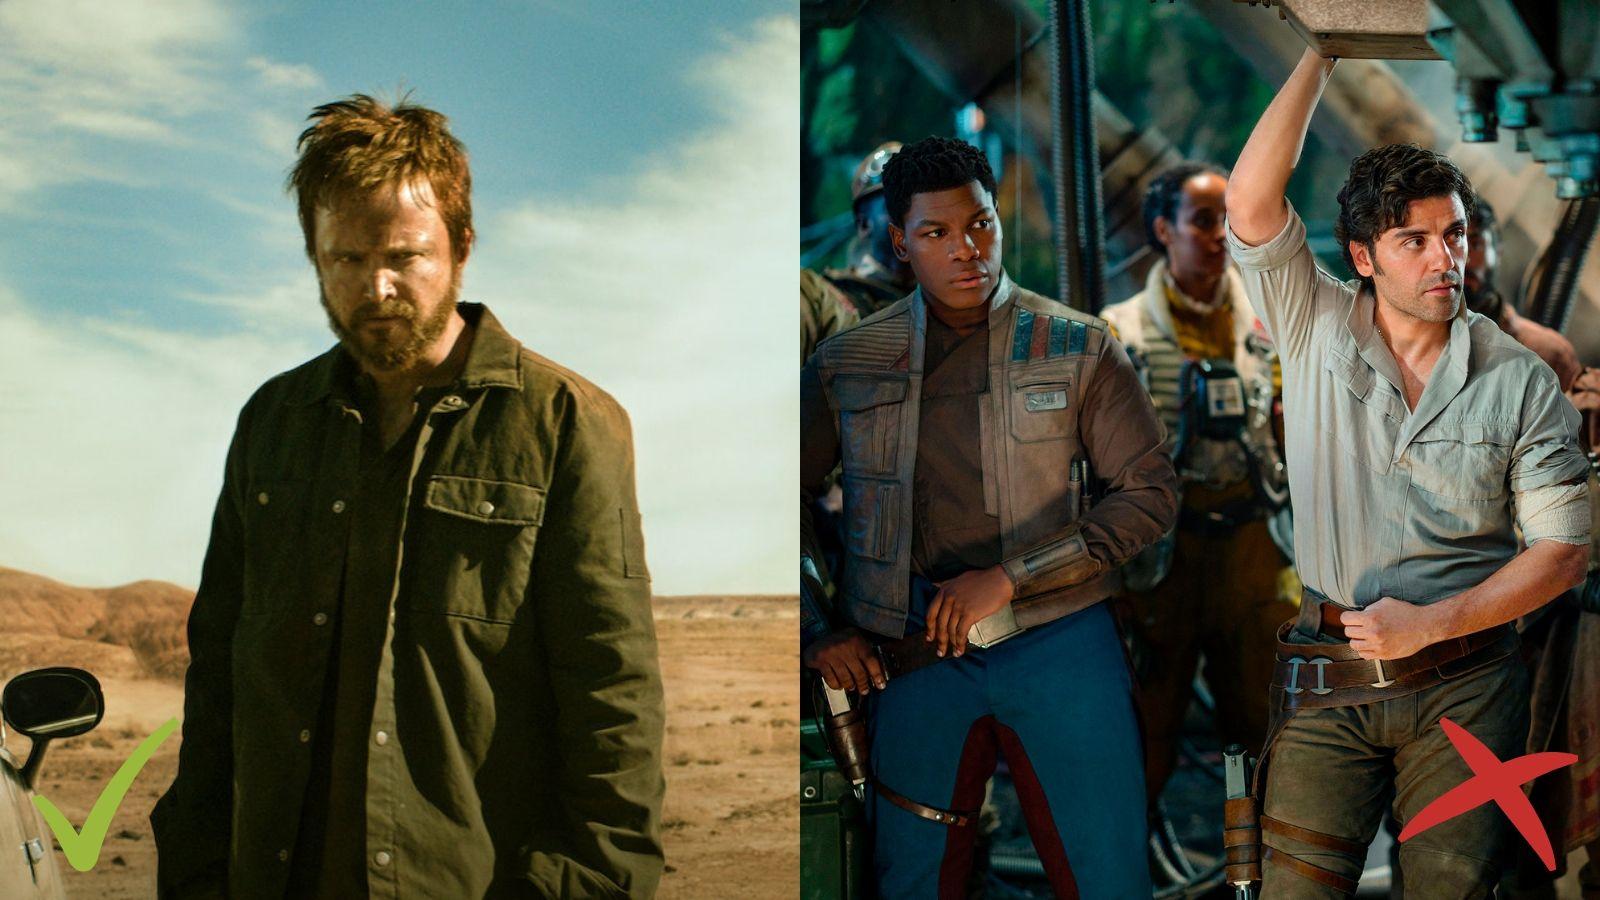 El Camino: A Breaking Bad Movie, Star Wars: The Rise of Skywalker, Zvaigžņu kari: Skaivokera atdzimšana